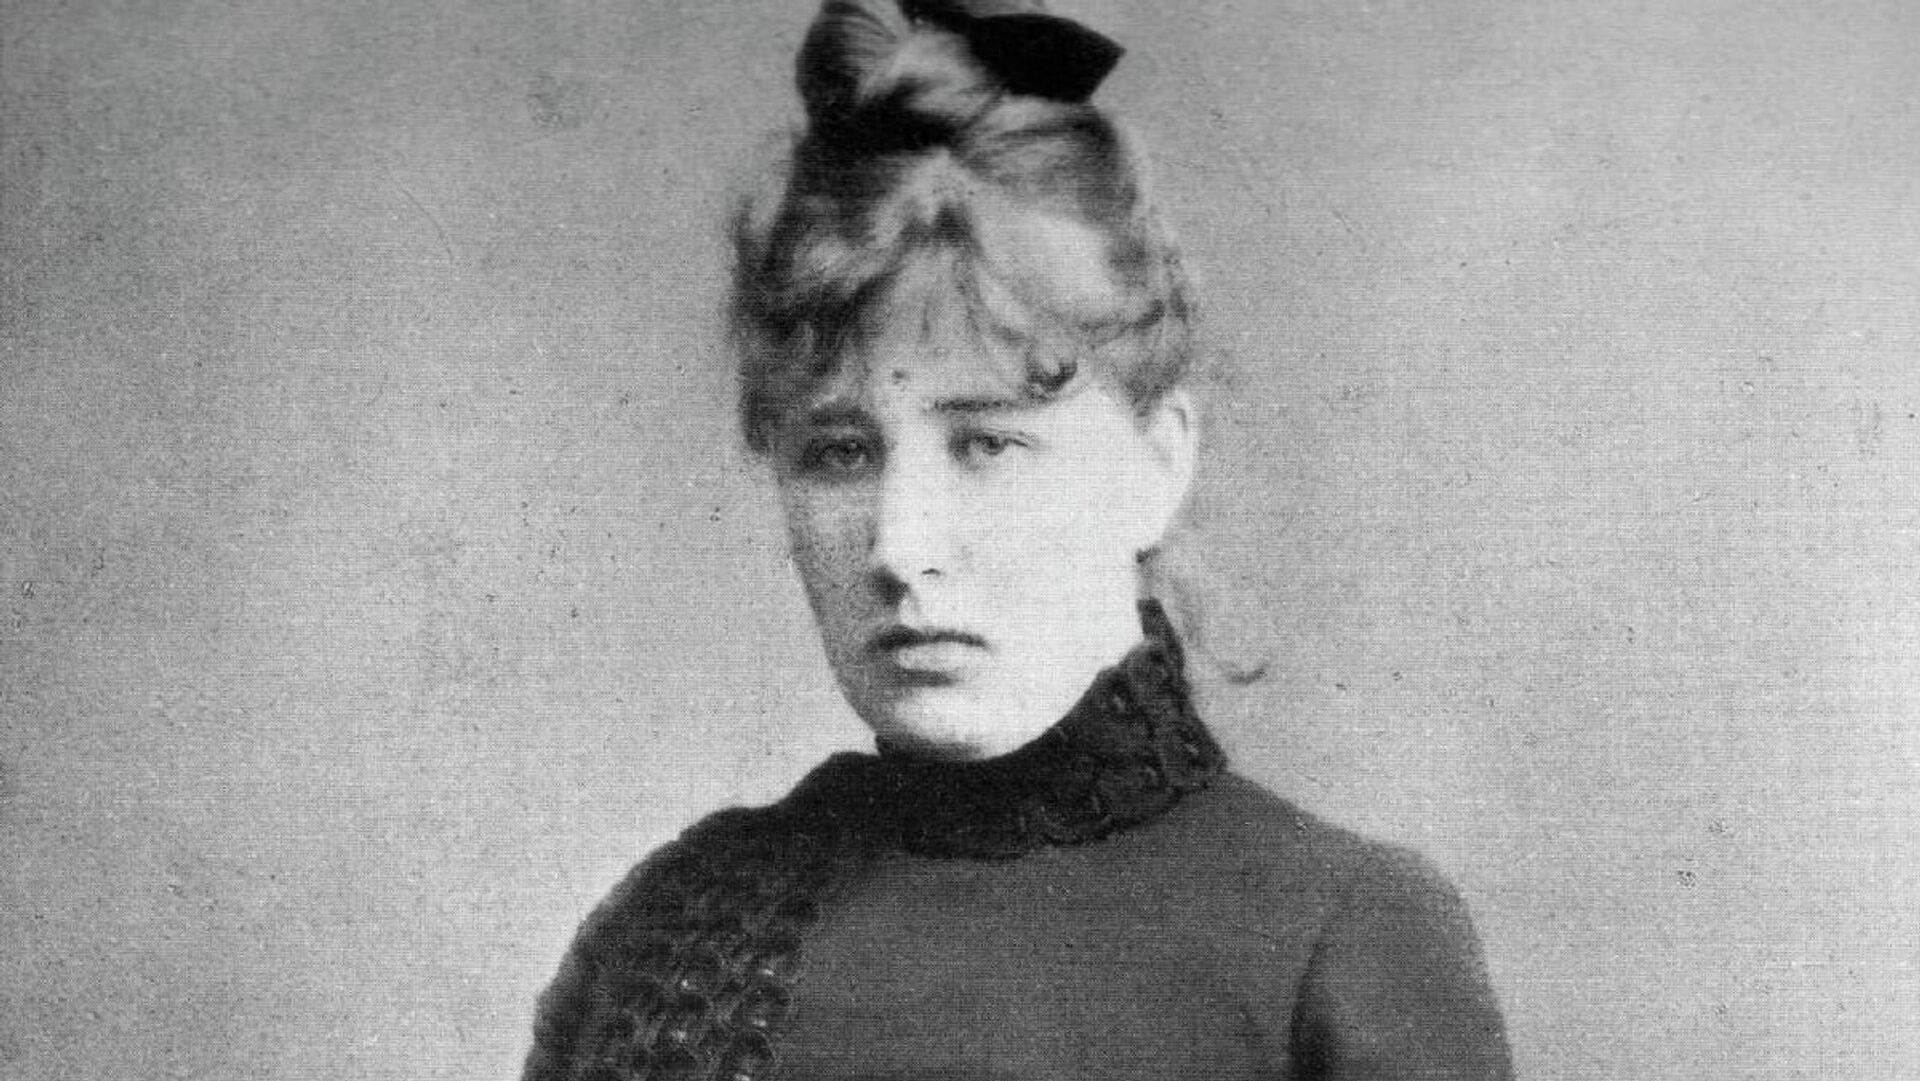 Nadezhda Lámanova, diseñadora de modas rusa y soviética  - Sputnik Mundo, 1920, 23.04.2021